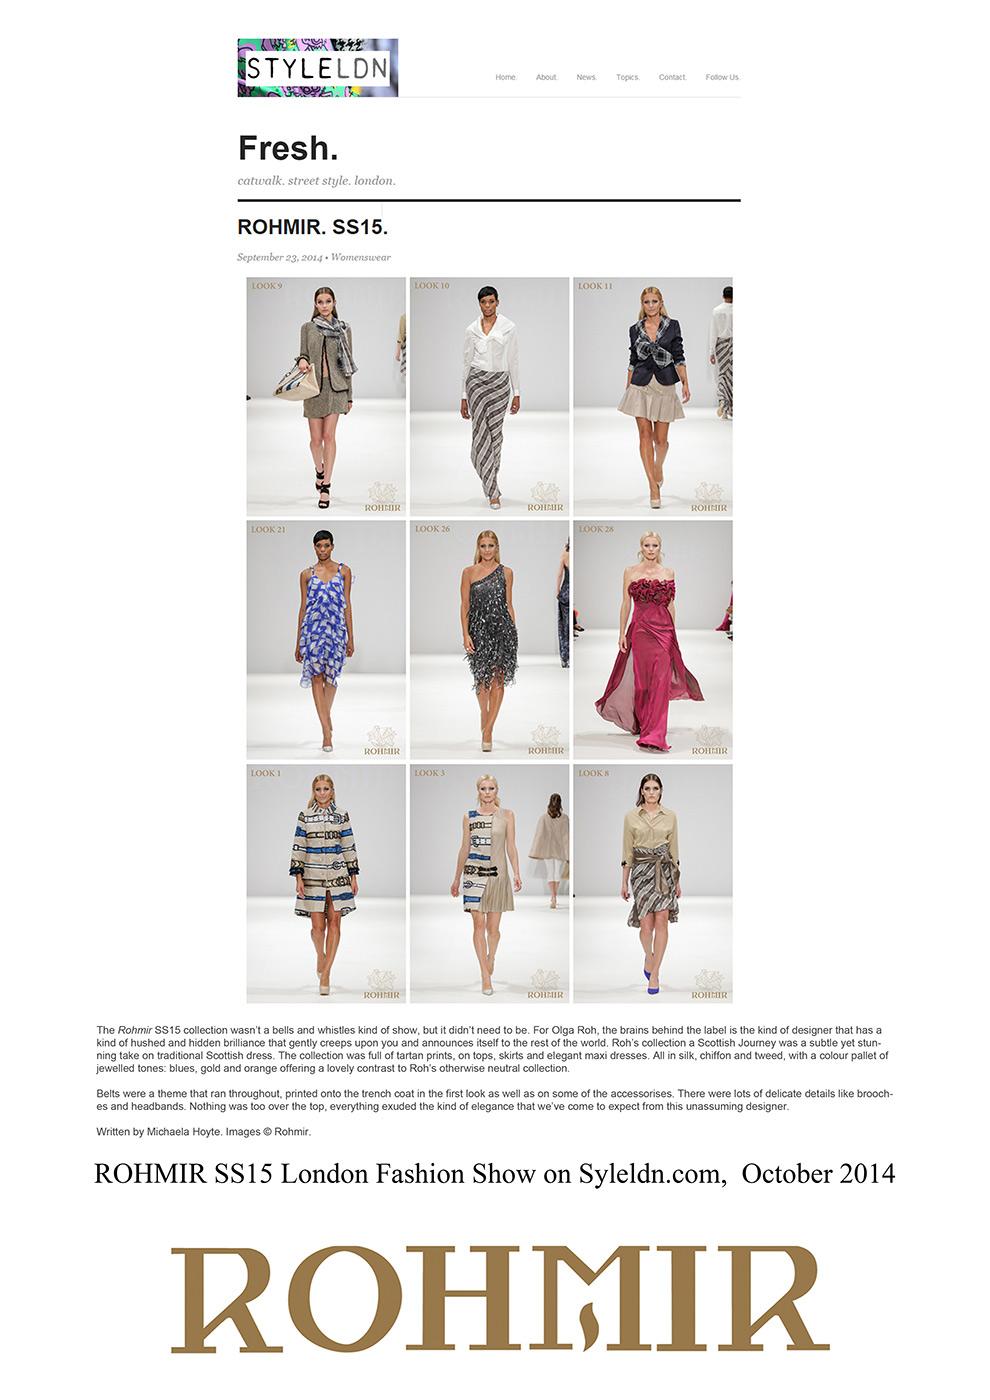 ROHMIR-SS15-London-Fashion-Show-on-Syleldn